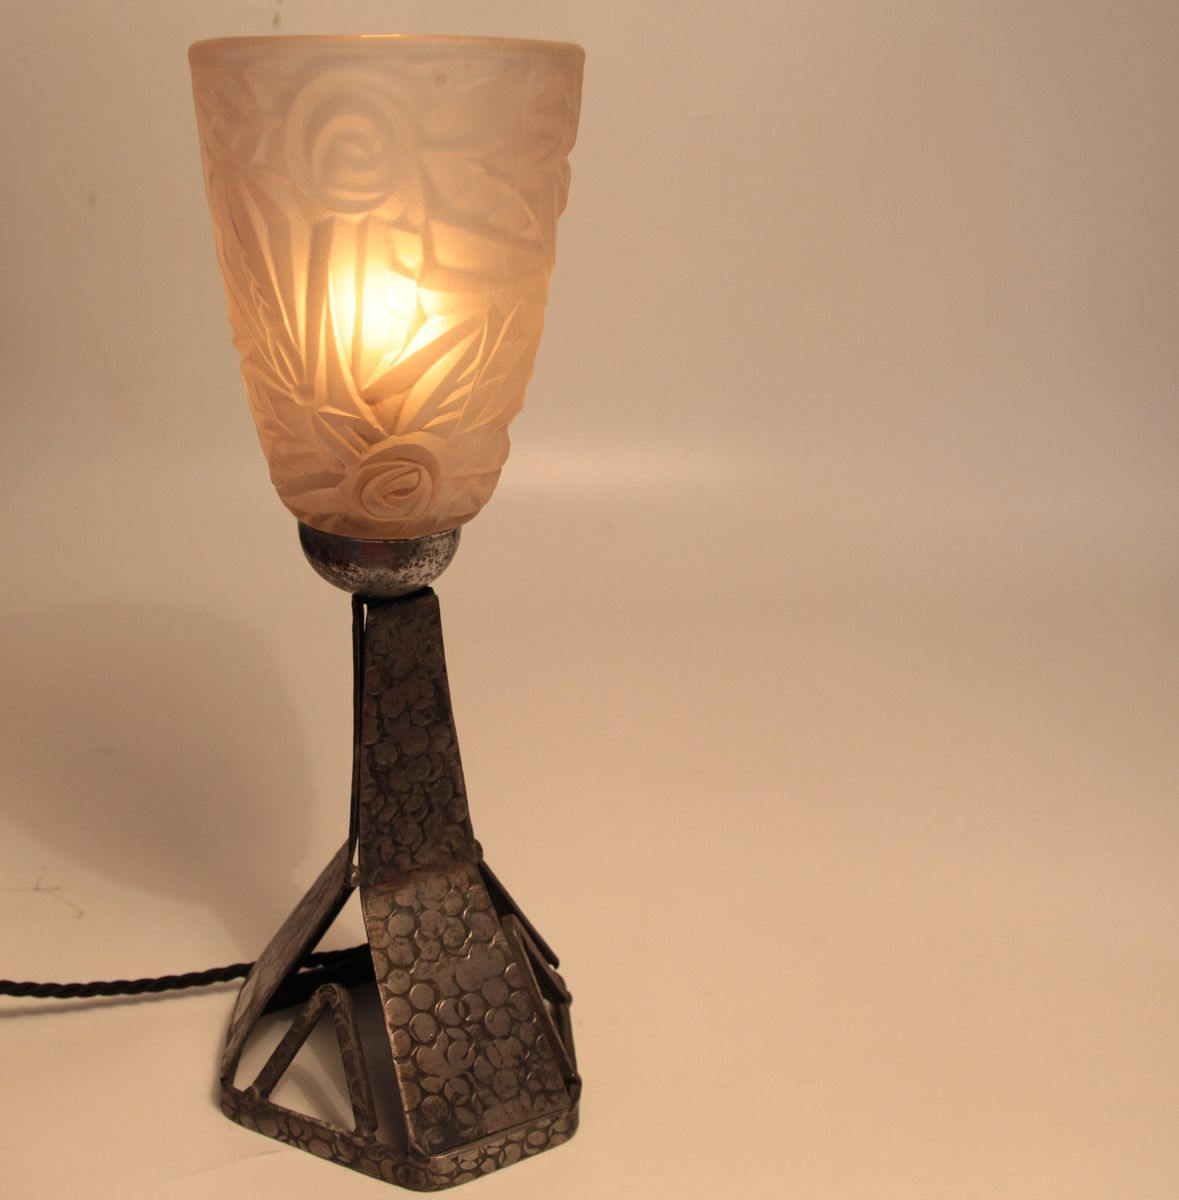 lampe de bureau art d co en fer forg france en vente sur pamono. Black Bedroom Furniture Sets. Home Design Ideas